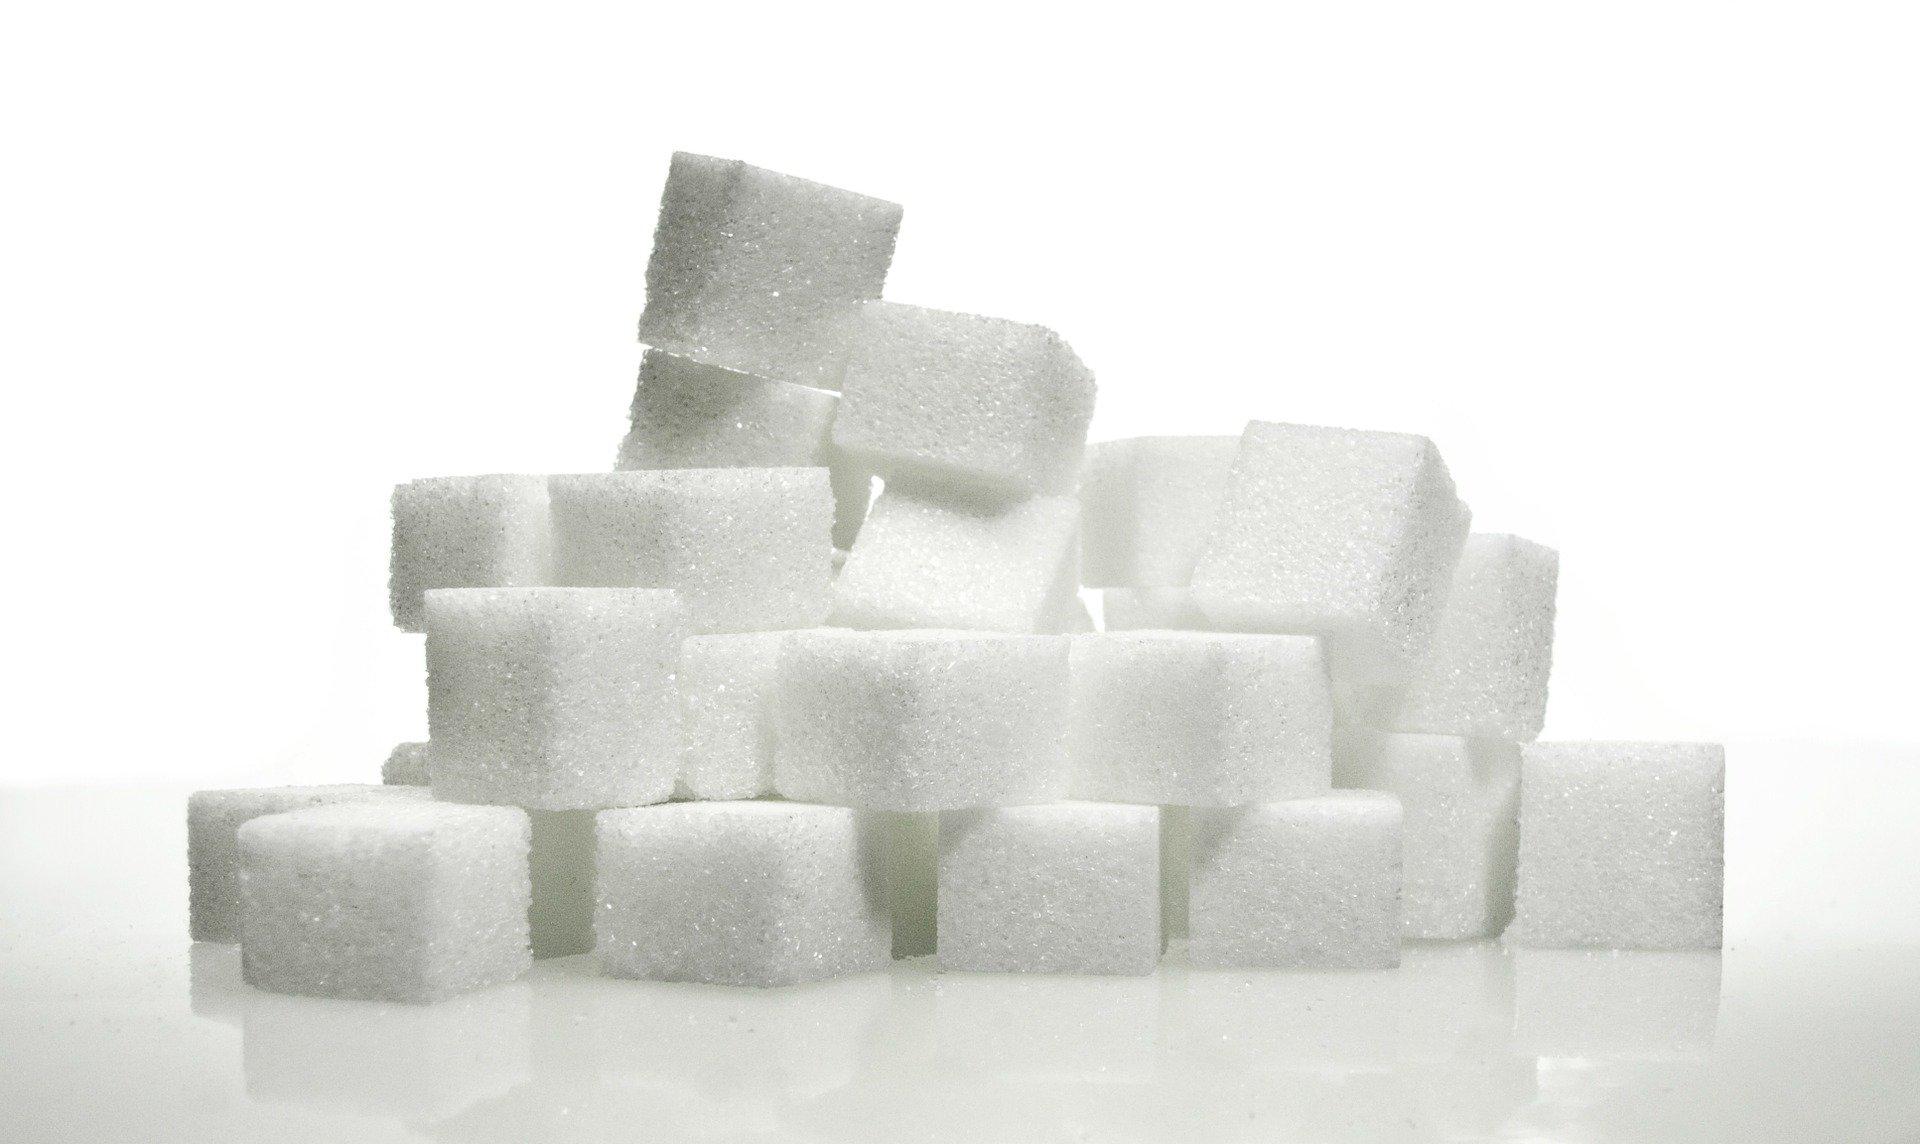 A pile of sugar cubes.